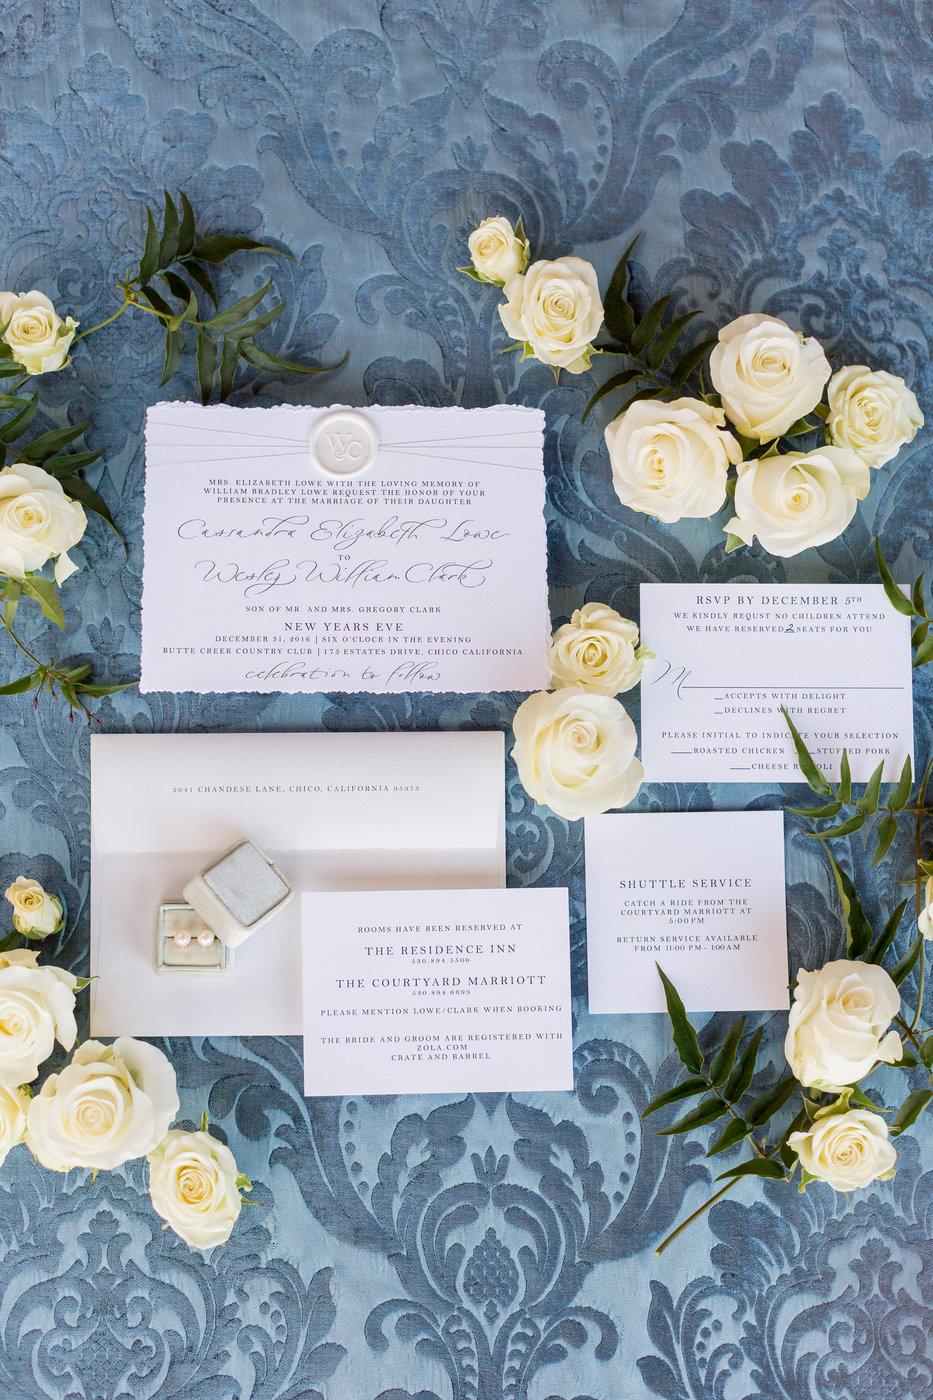 la-tavola-fine-linen-used-at-wedding-receptionjpg